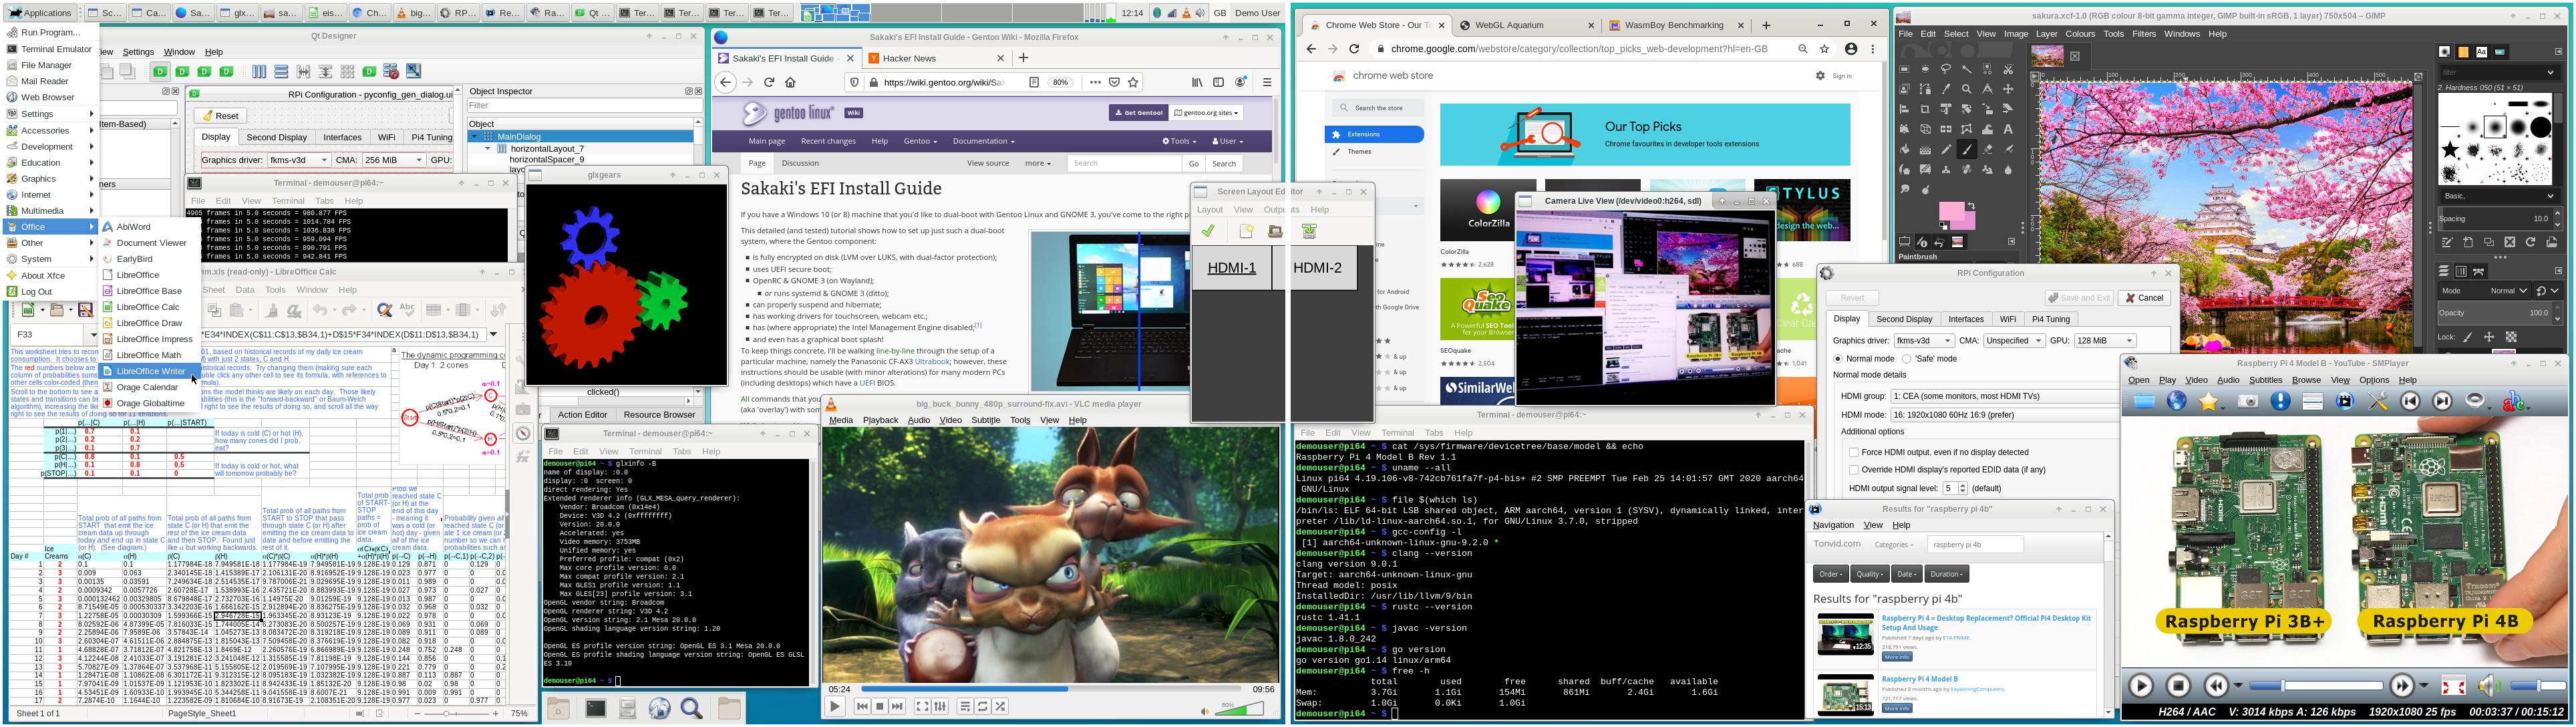 Gentoo Running on Raspberry Pi 4B